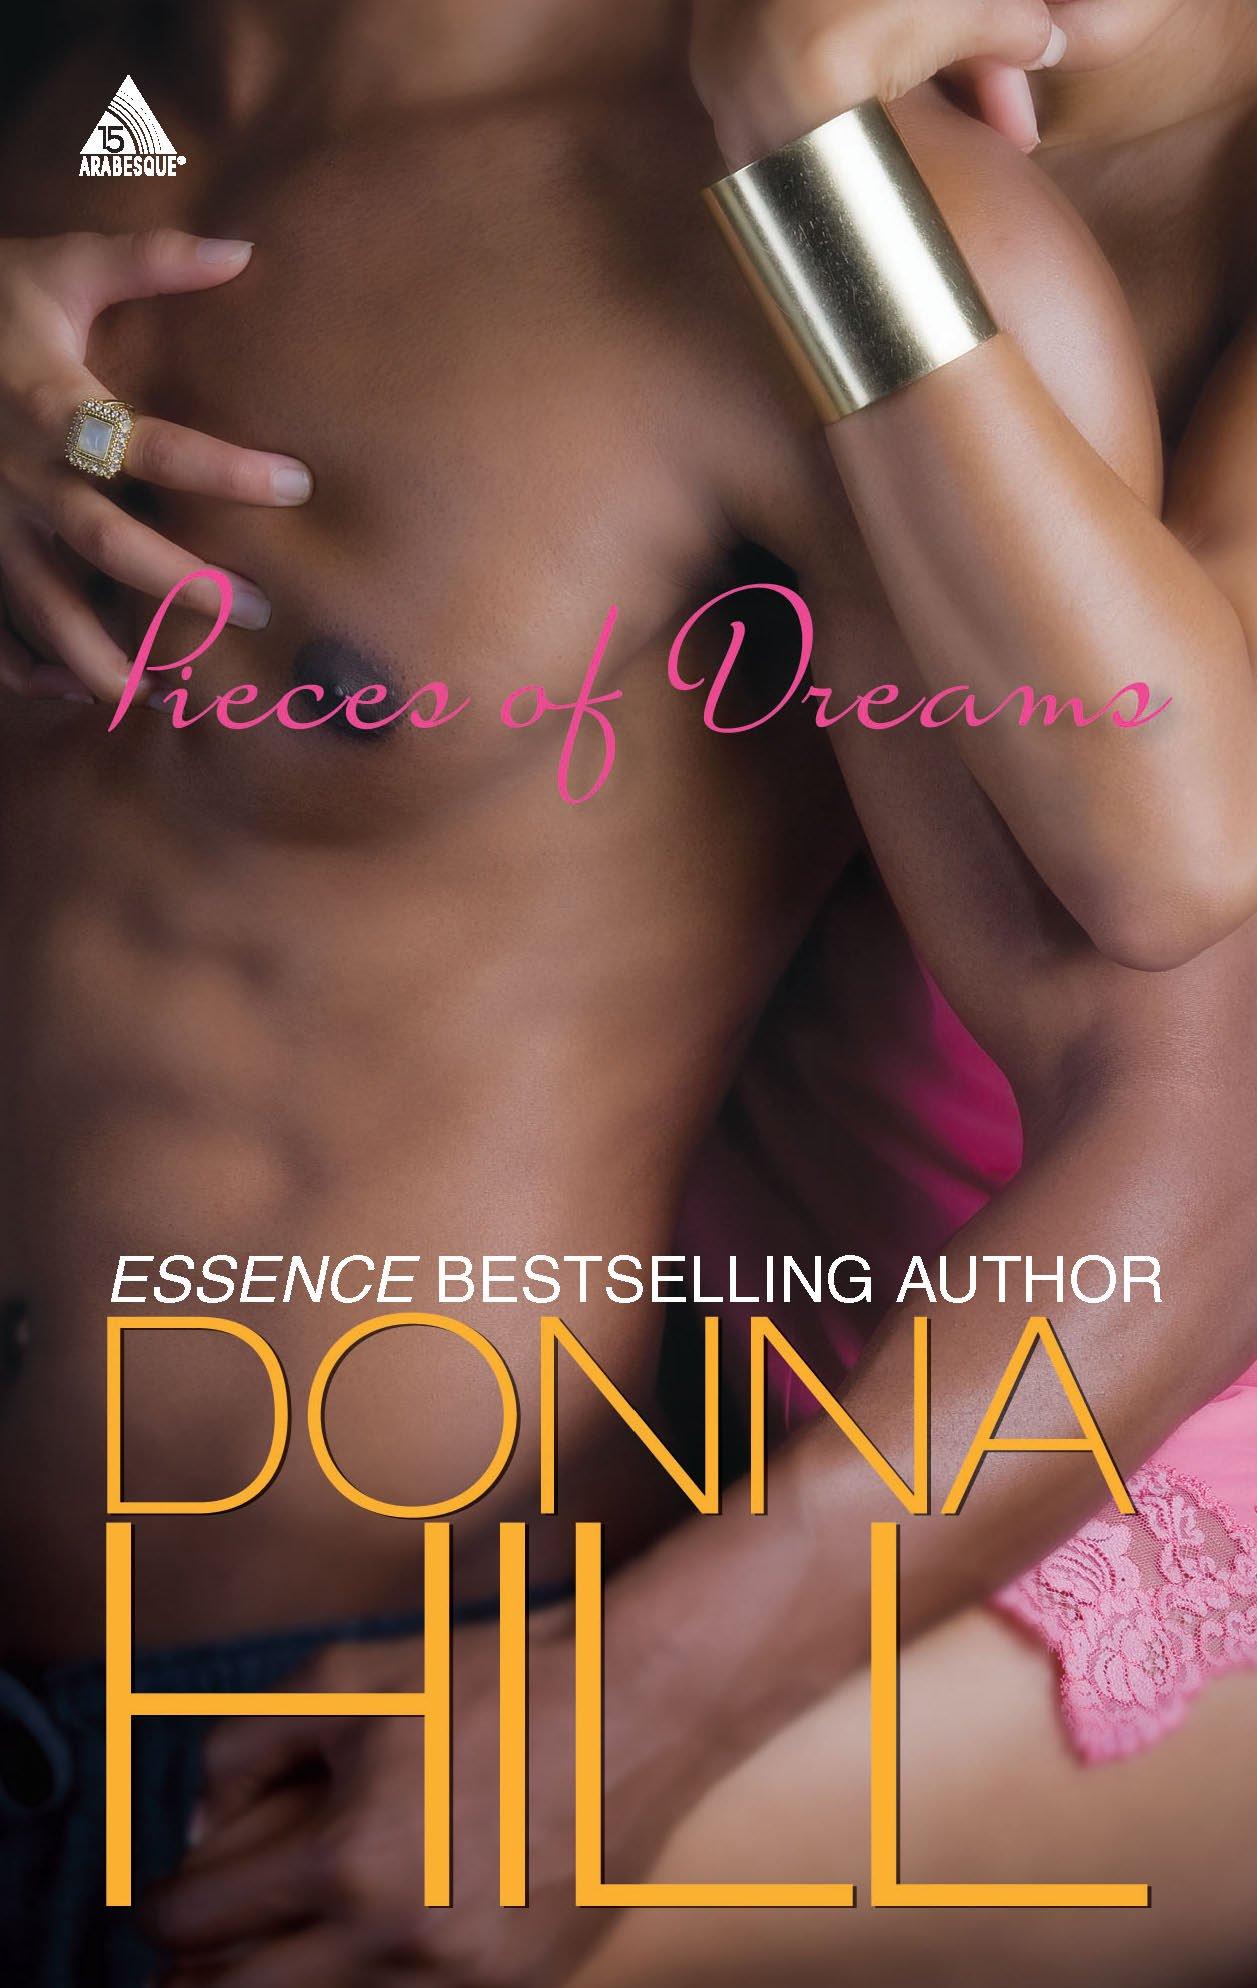 Amazon.com: Pieces Of Dreams (Arabesque) (9780373831630): Donna Hill: Books